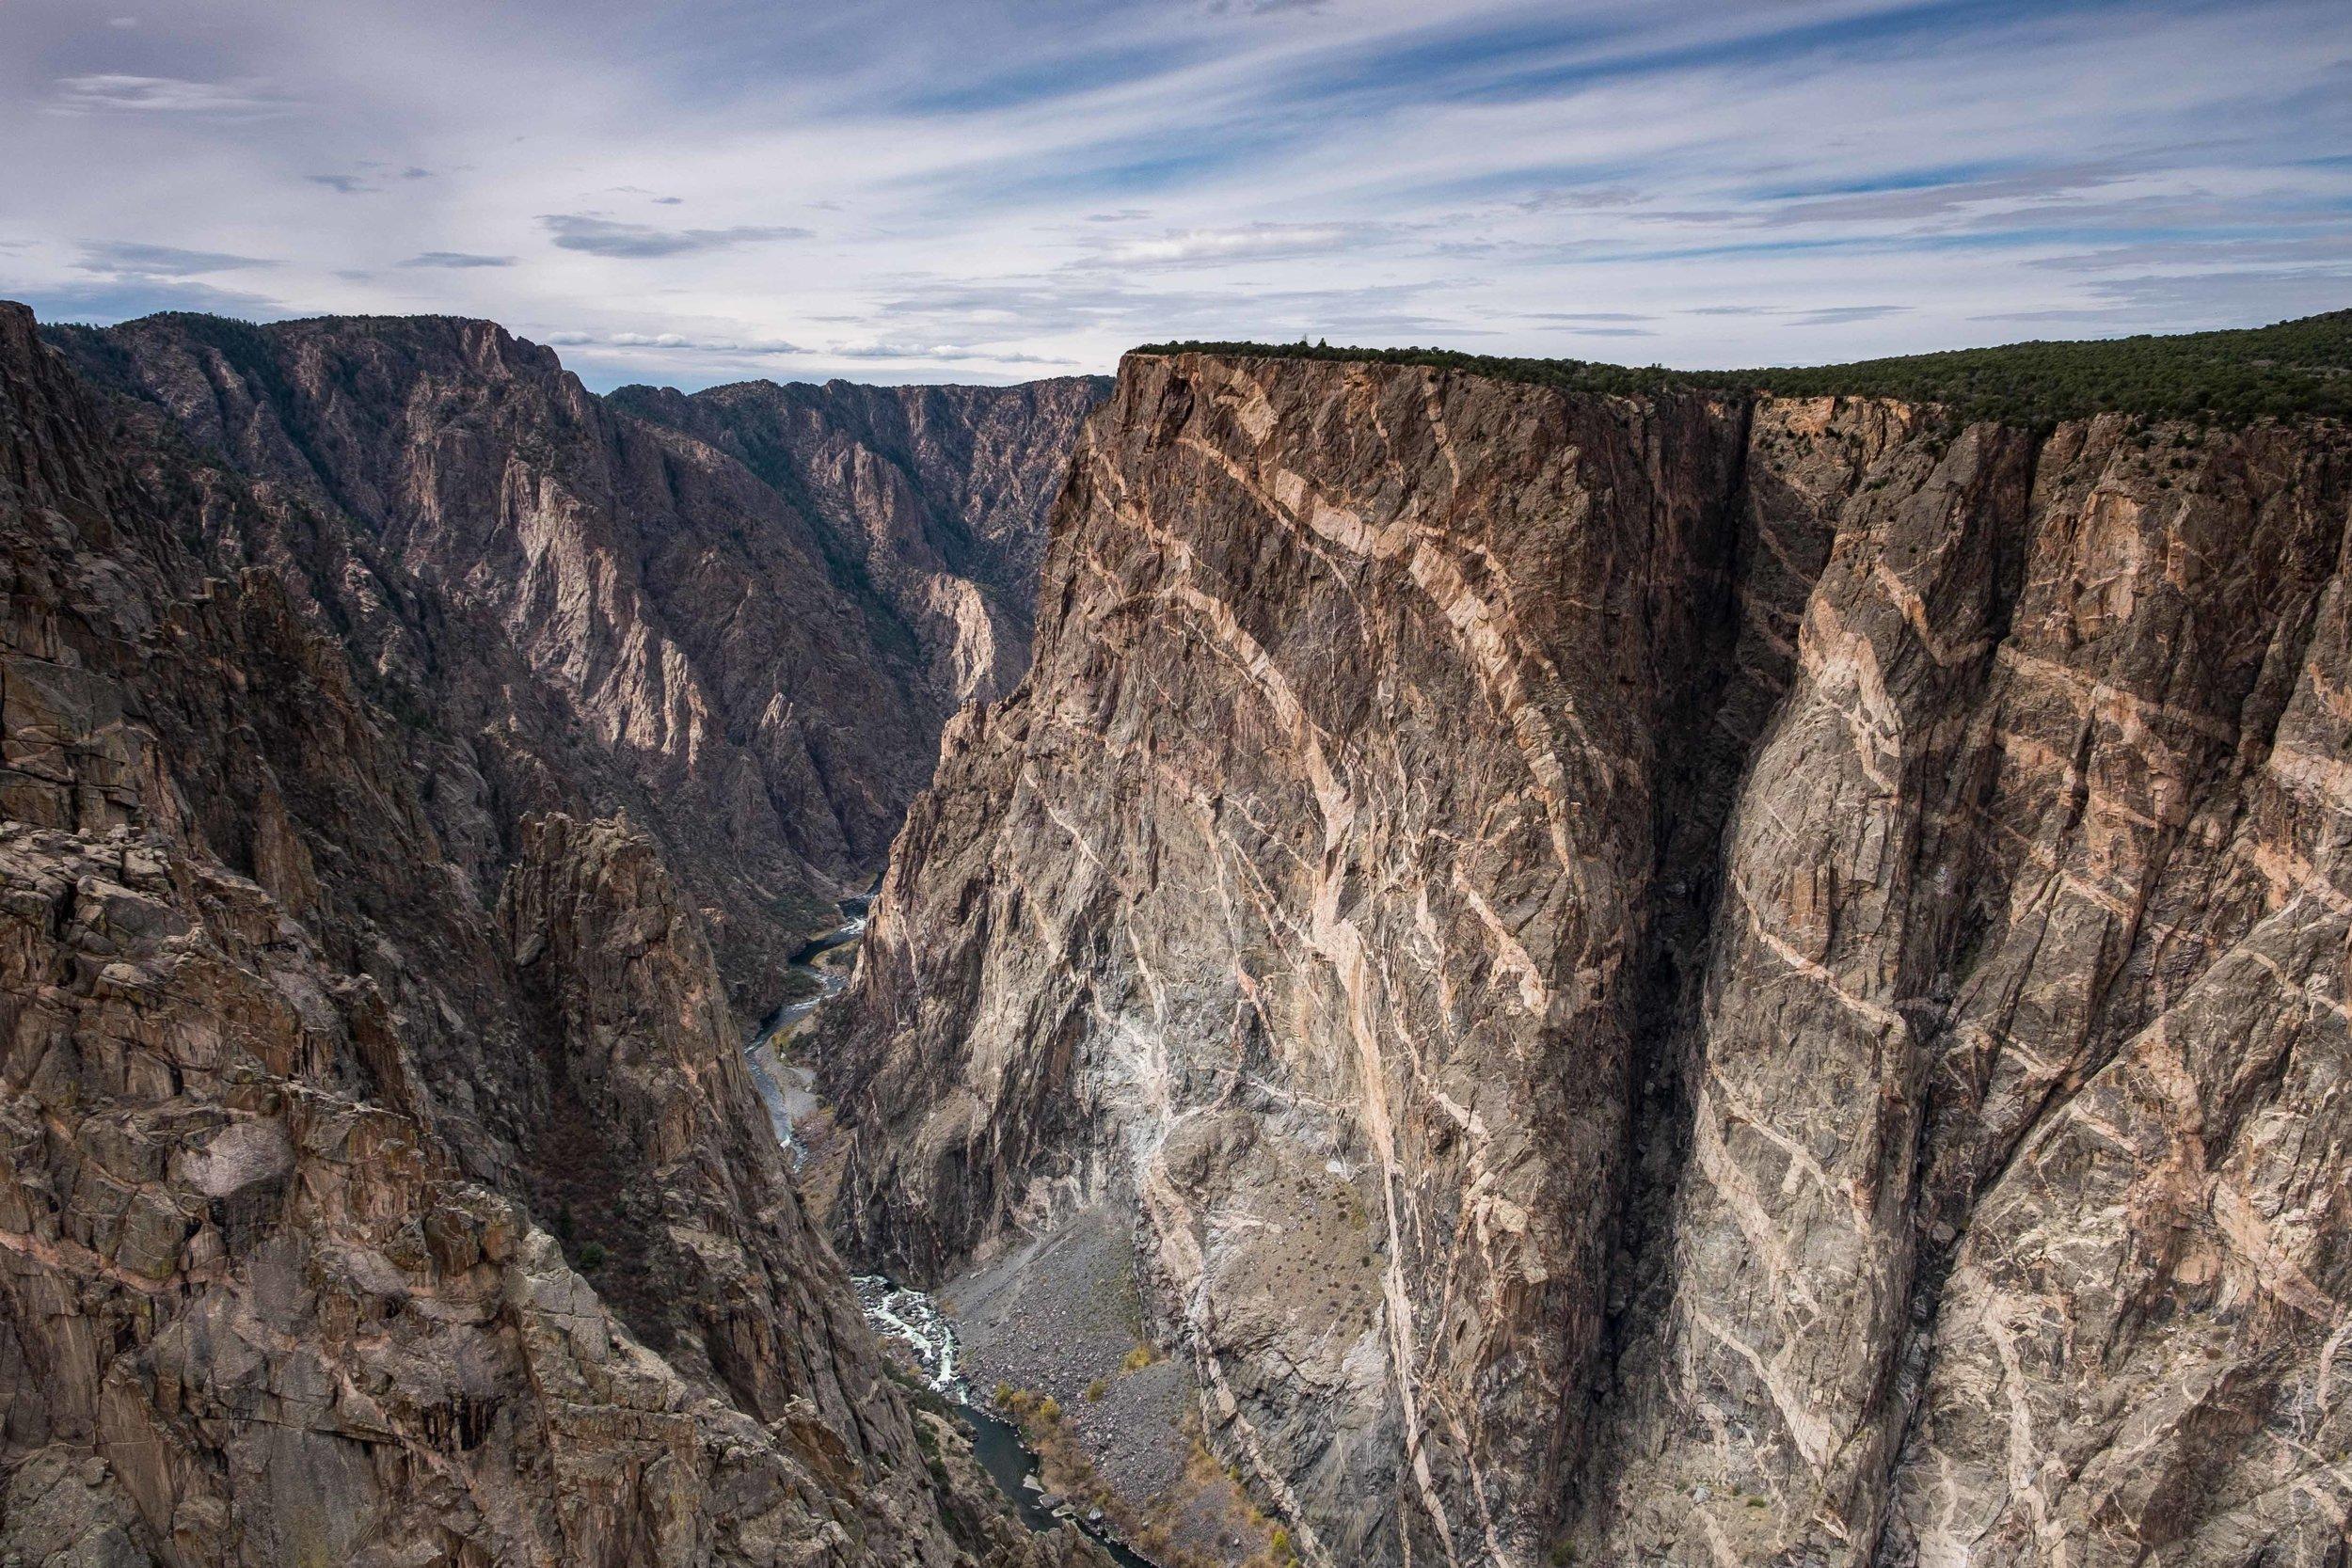 Black Canyon of the Gunnison National Park - 010.jpg